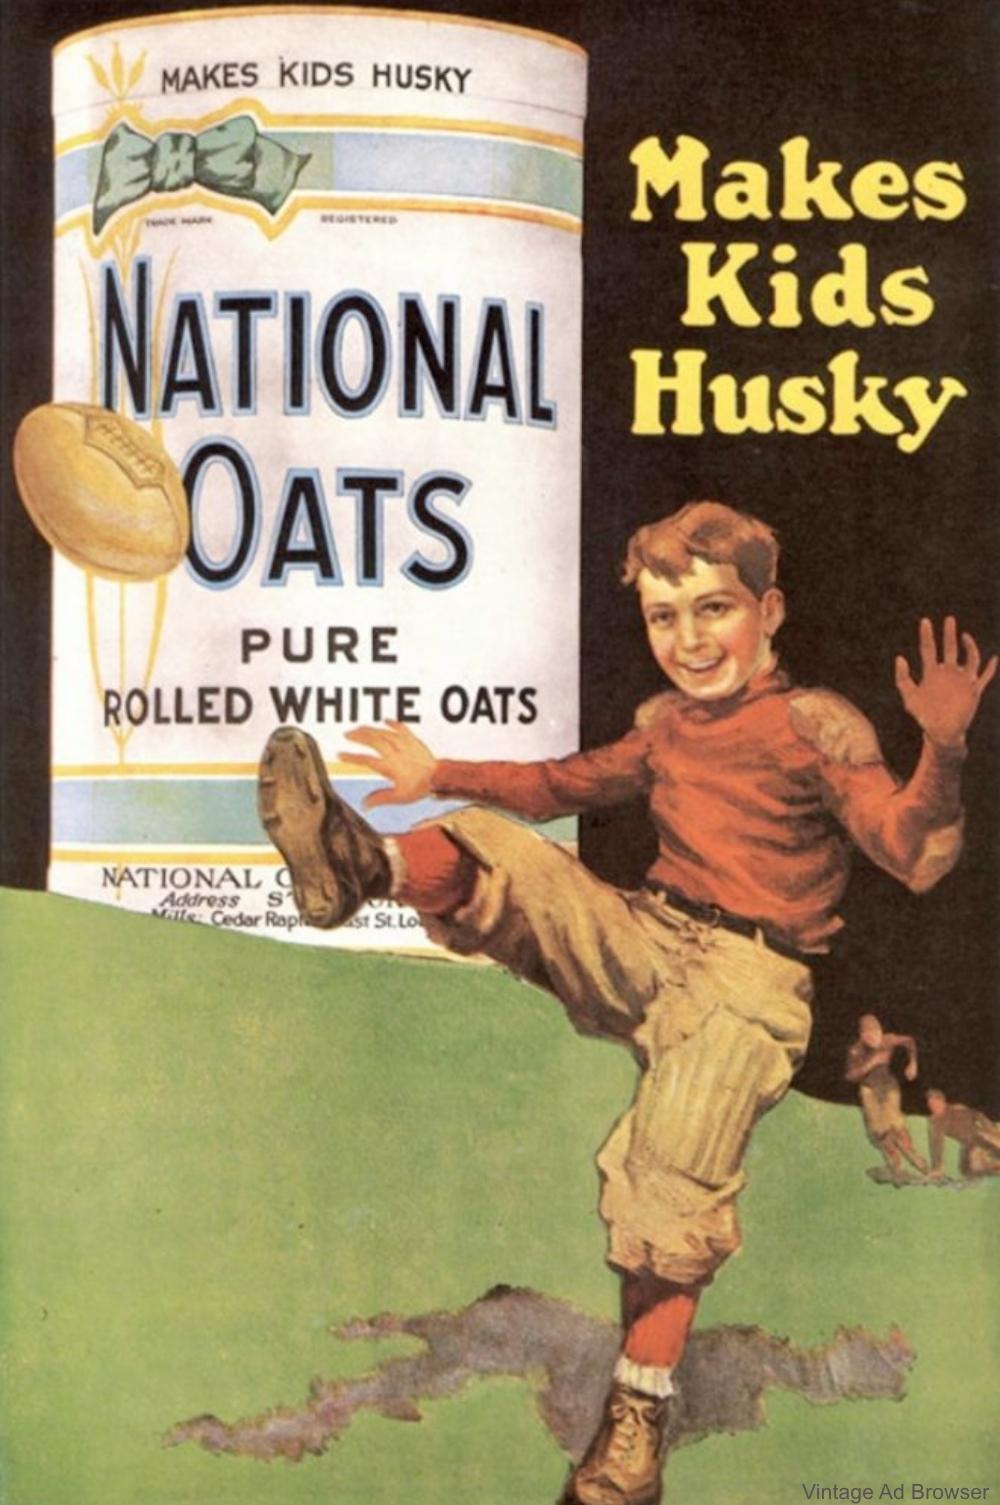 National Oats Makes Kids Husky Vintage Advertisement